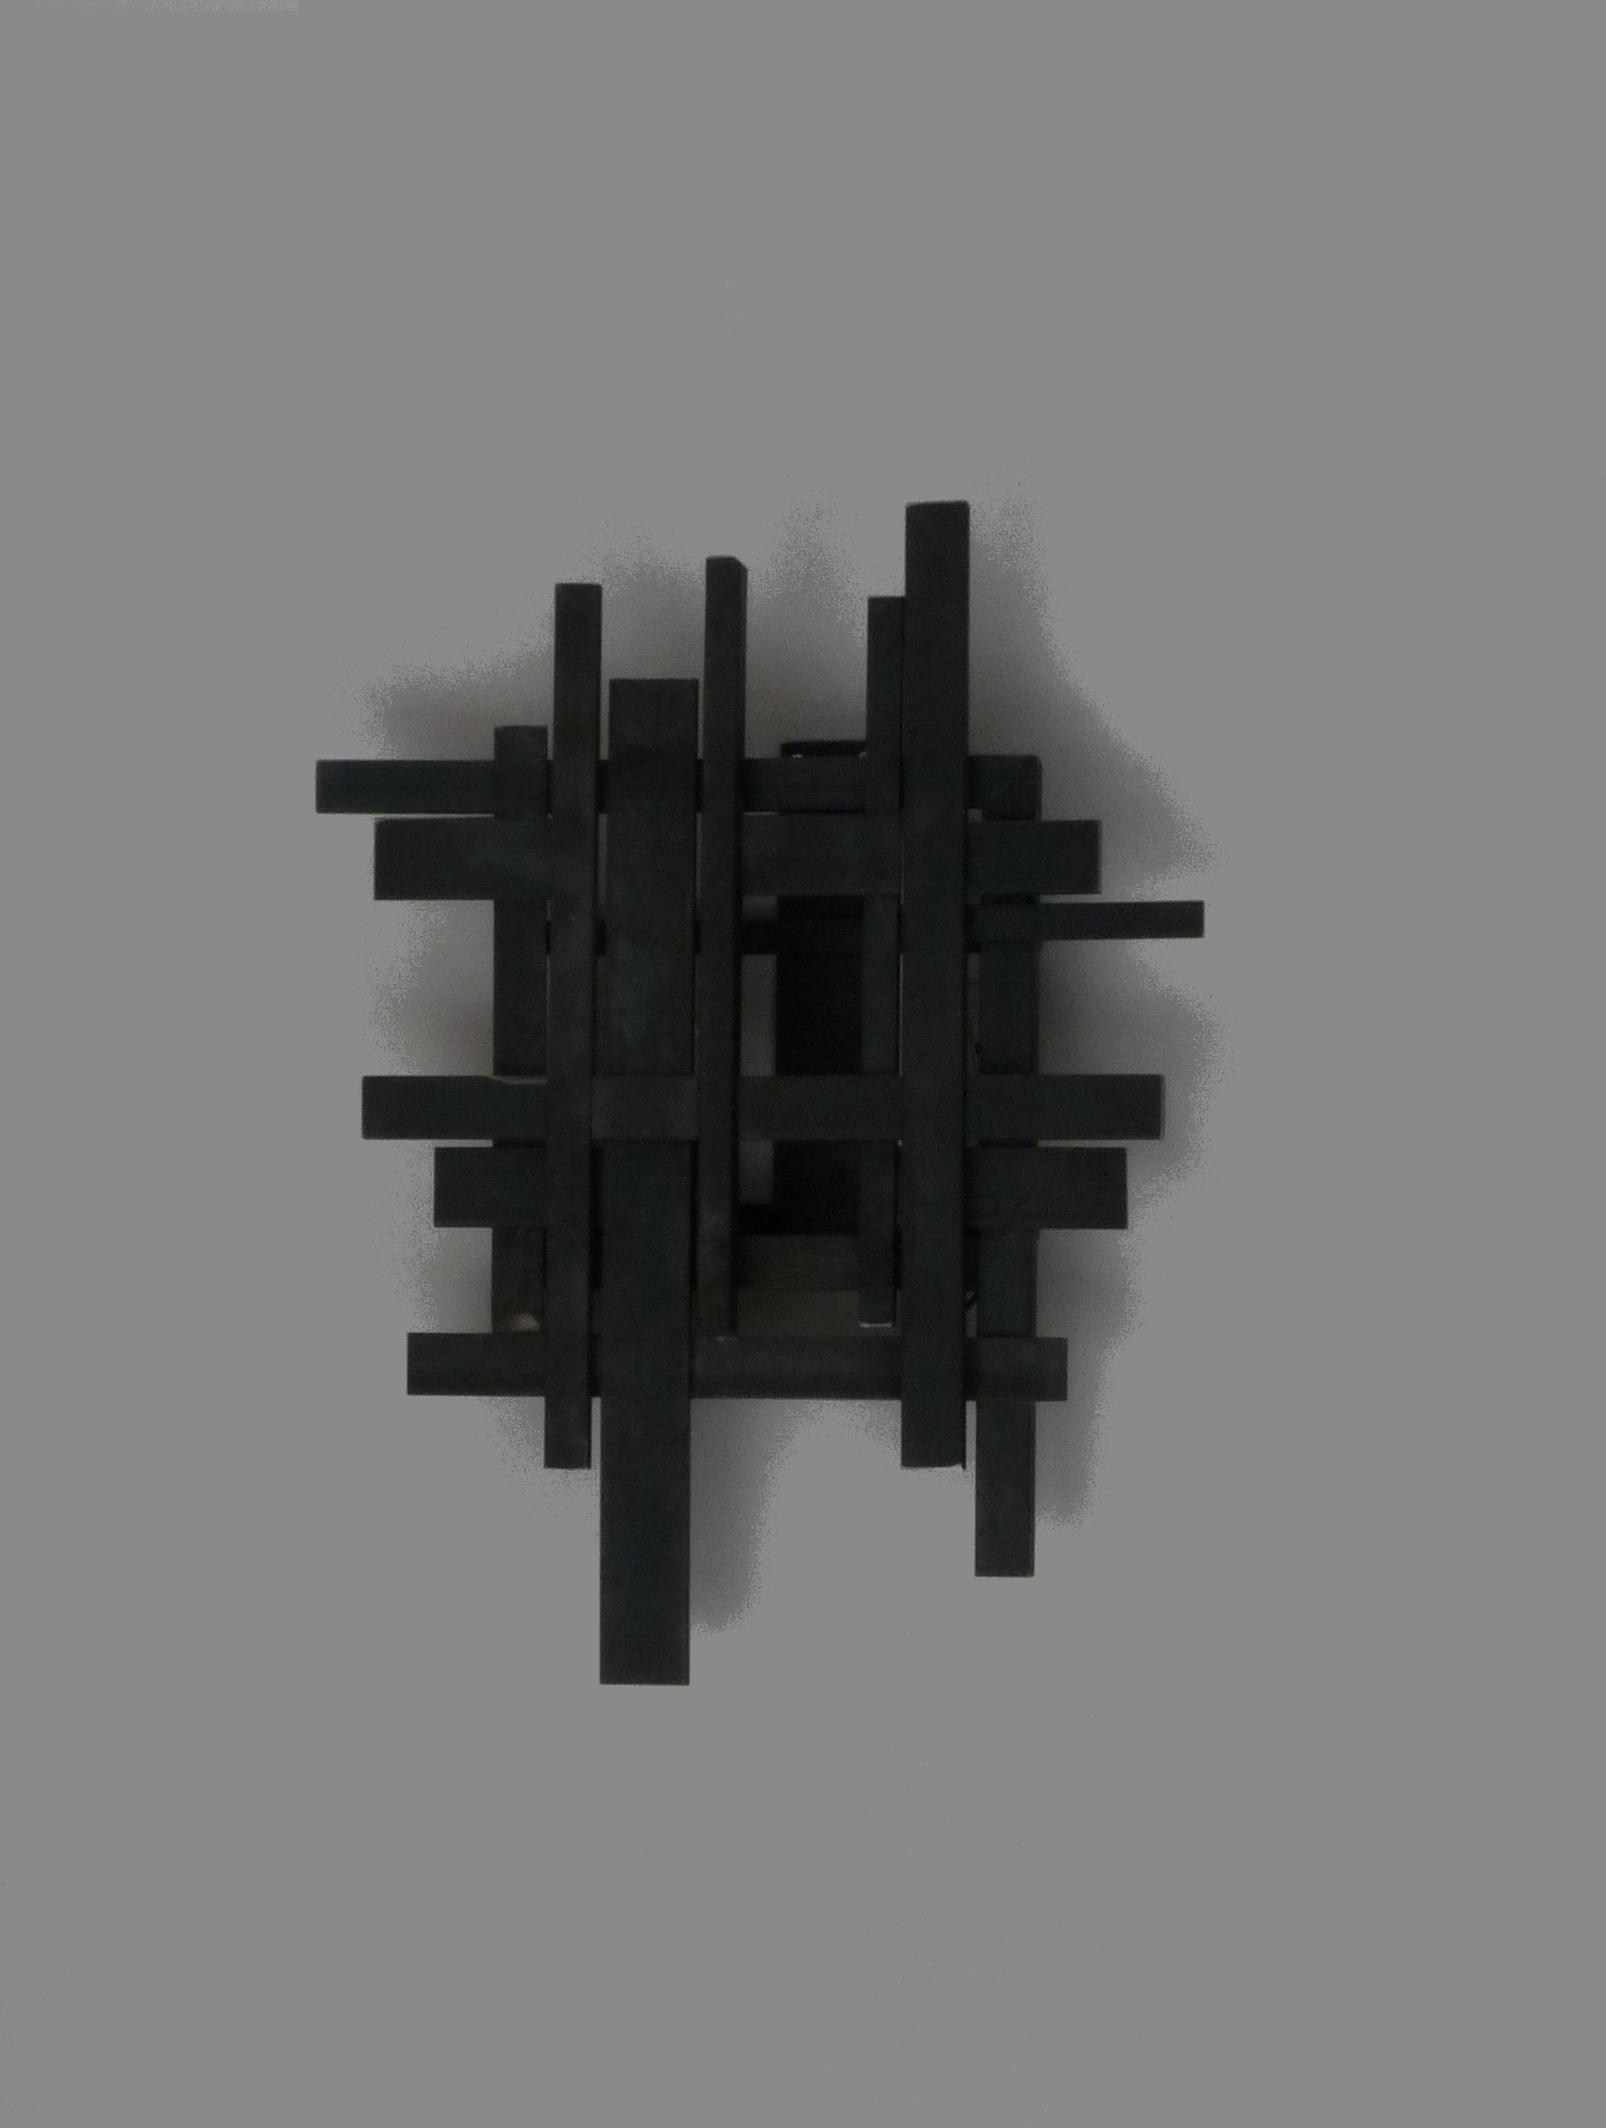 applique-owel-metal-design-clfcreation-2